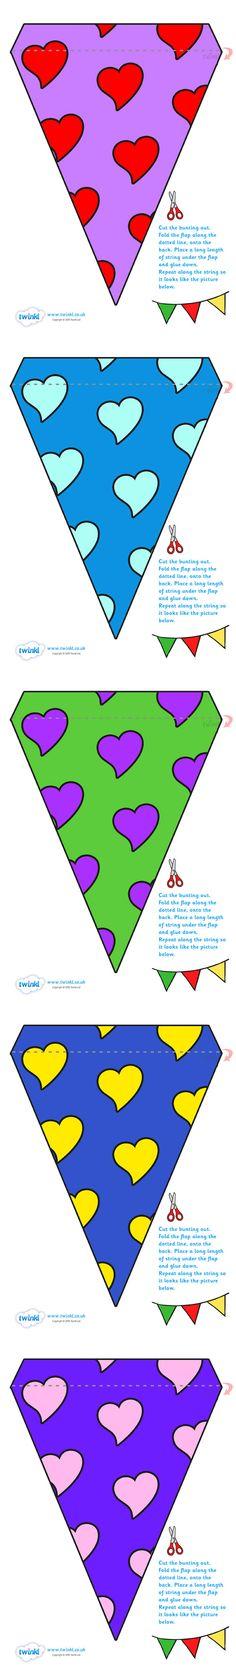 Twinkl Resources >> Display Bunting- Hearts >> Classroom printables for Pre-School, Kindergarten, Elementary School and beyond! Decor, Buntings, Display